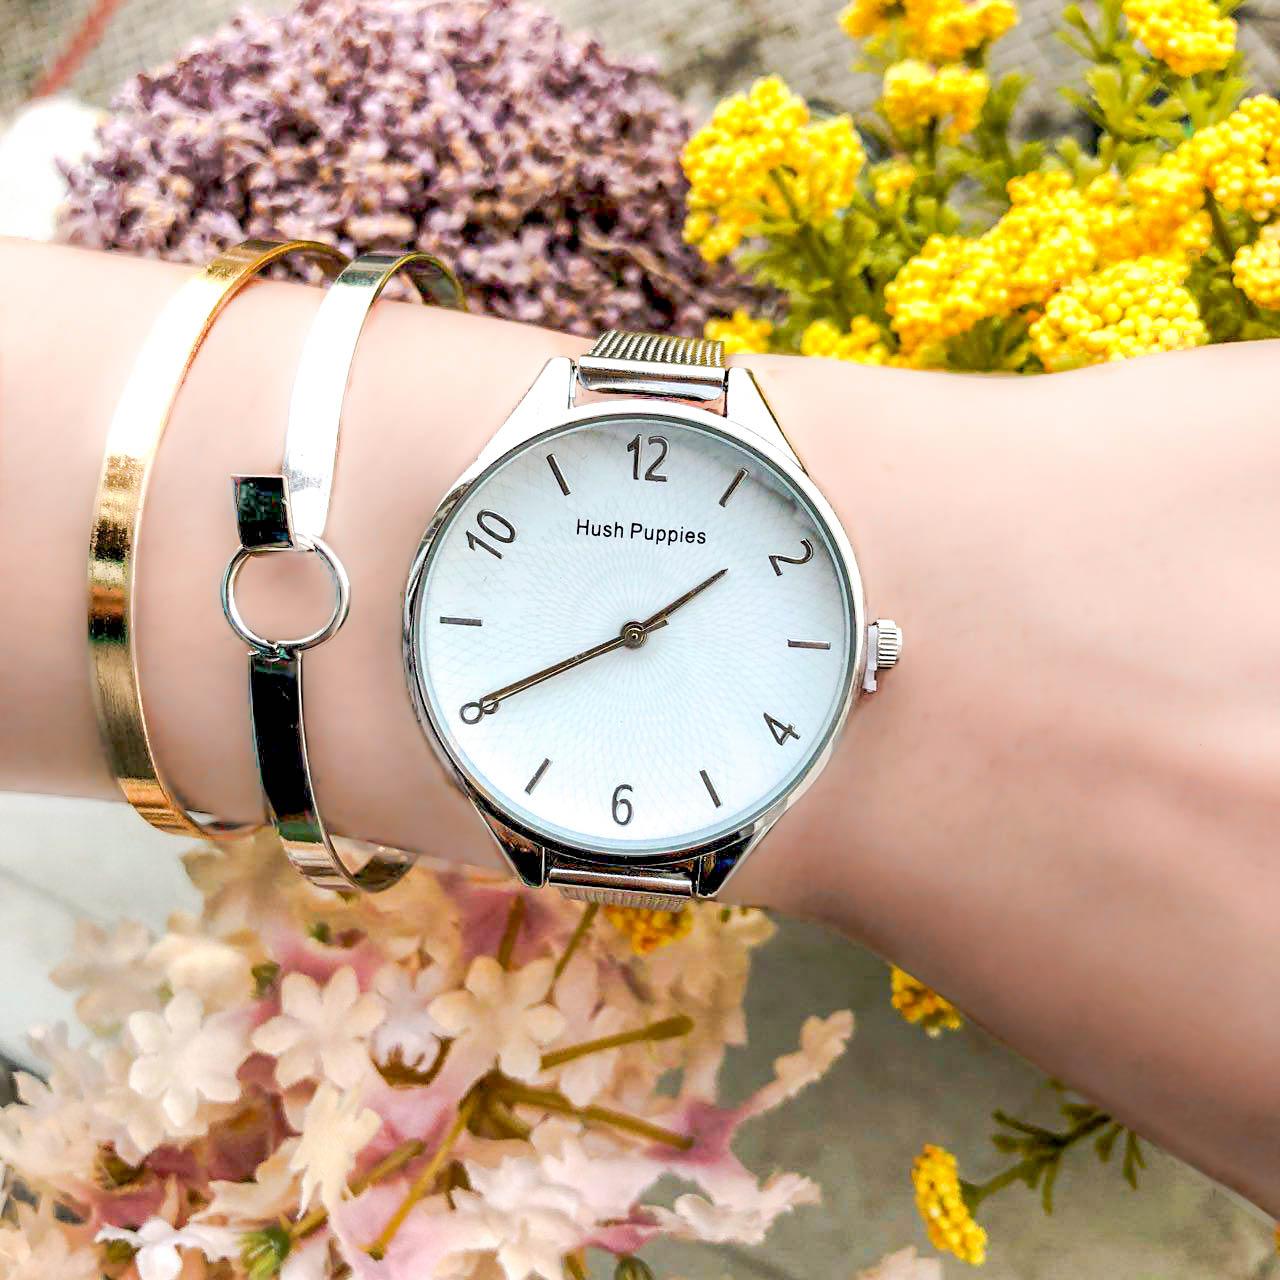 Jam Tangan HP Fashion Watch Chain Silver Frame+Silver Dial+White Background+Silver Dial HPWC05